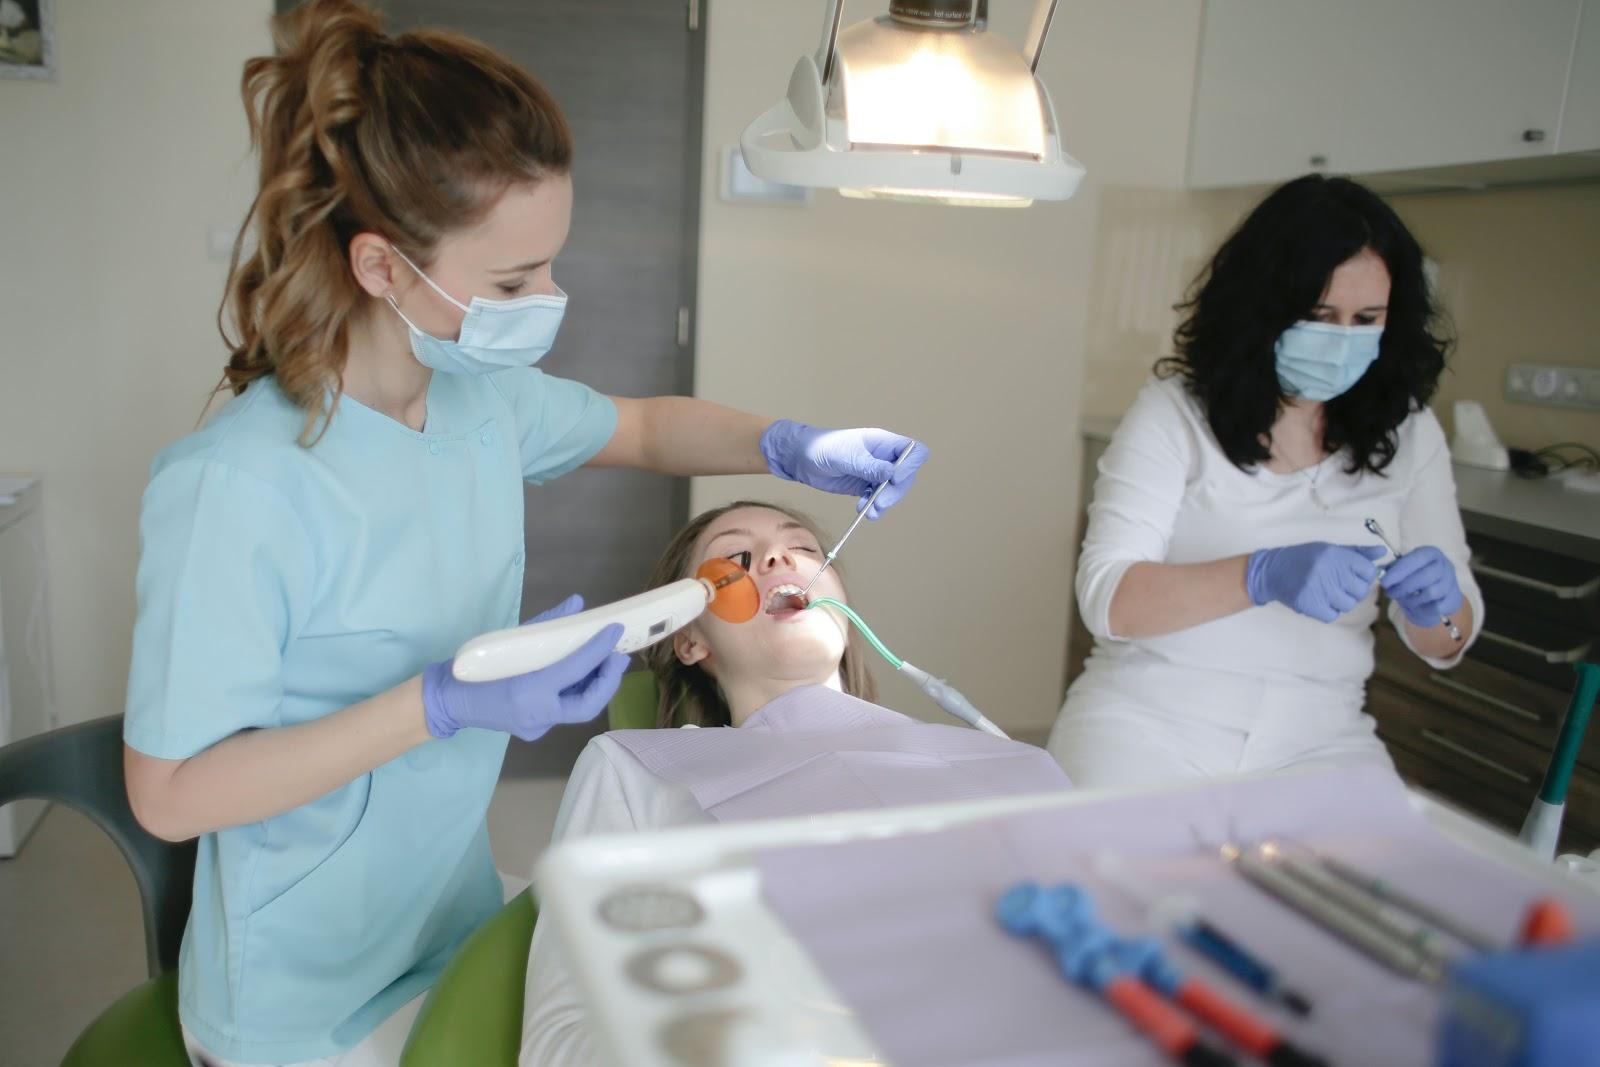 Get straight teeth by orthodontic headgear